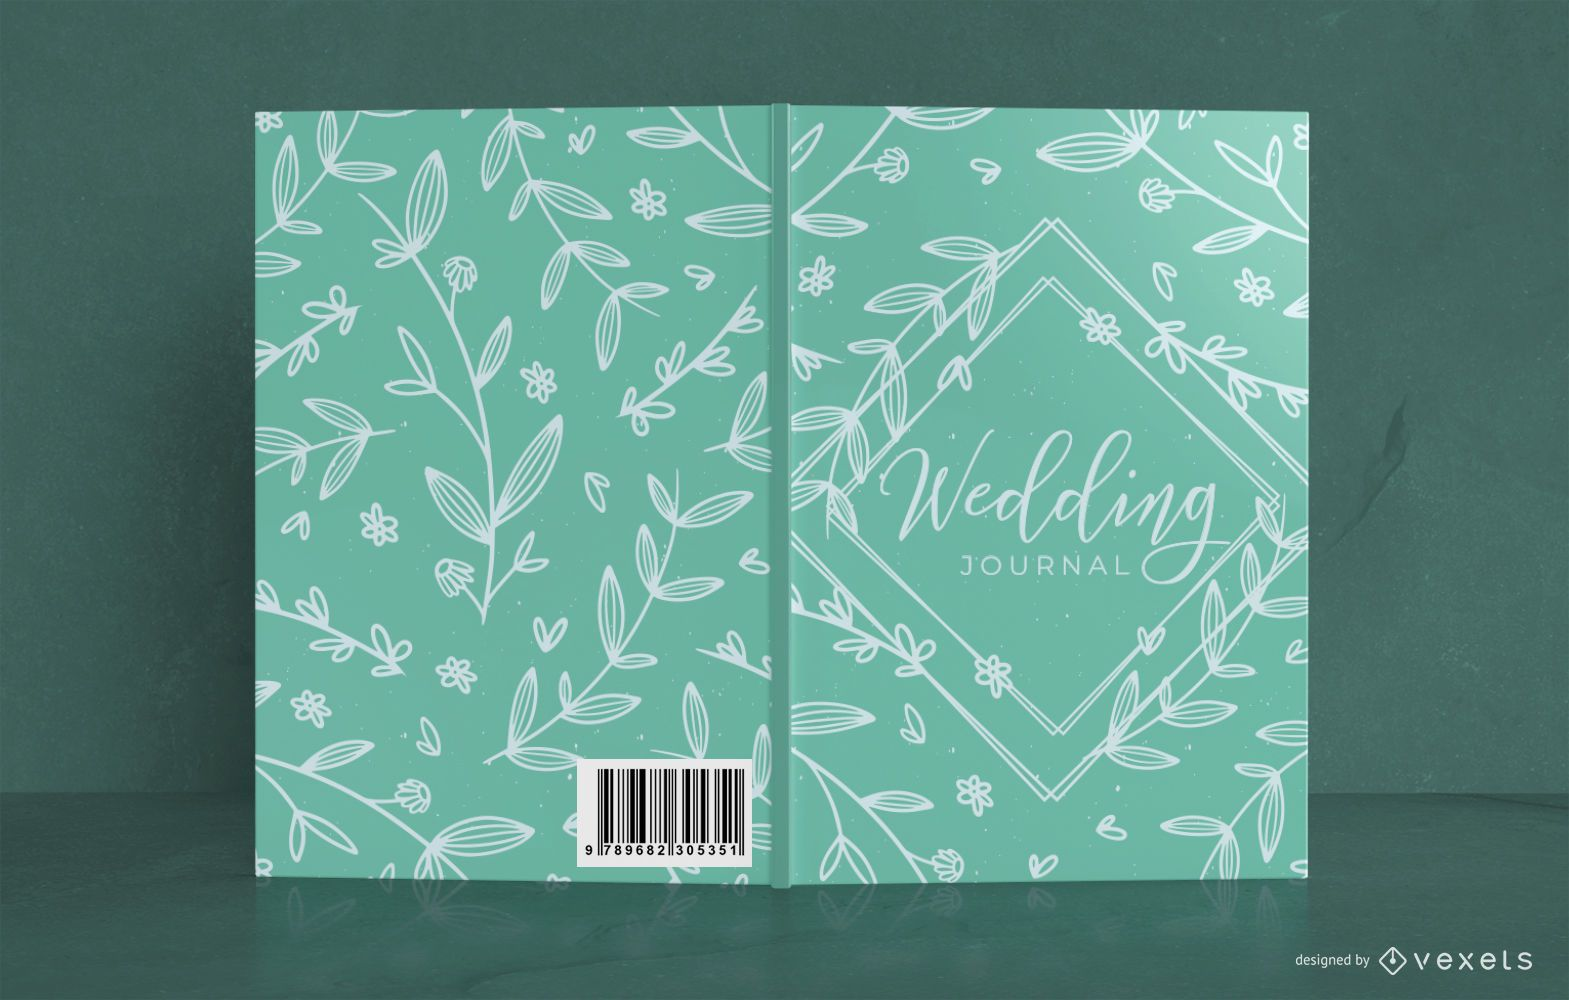 Wedding floral book cover design